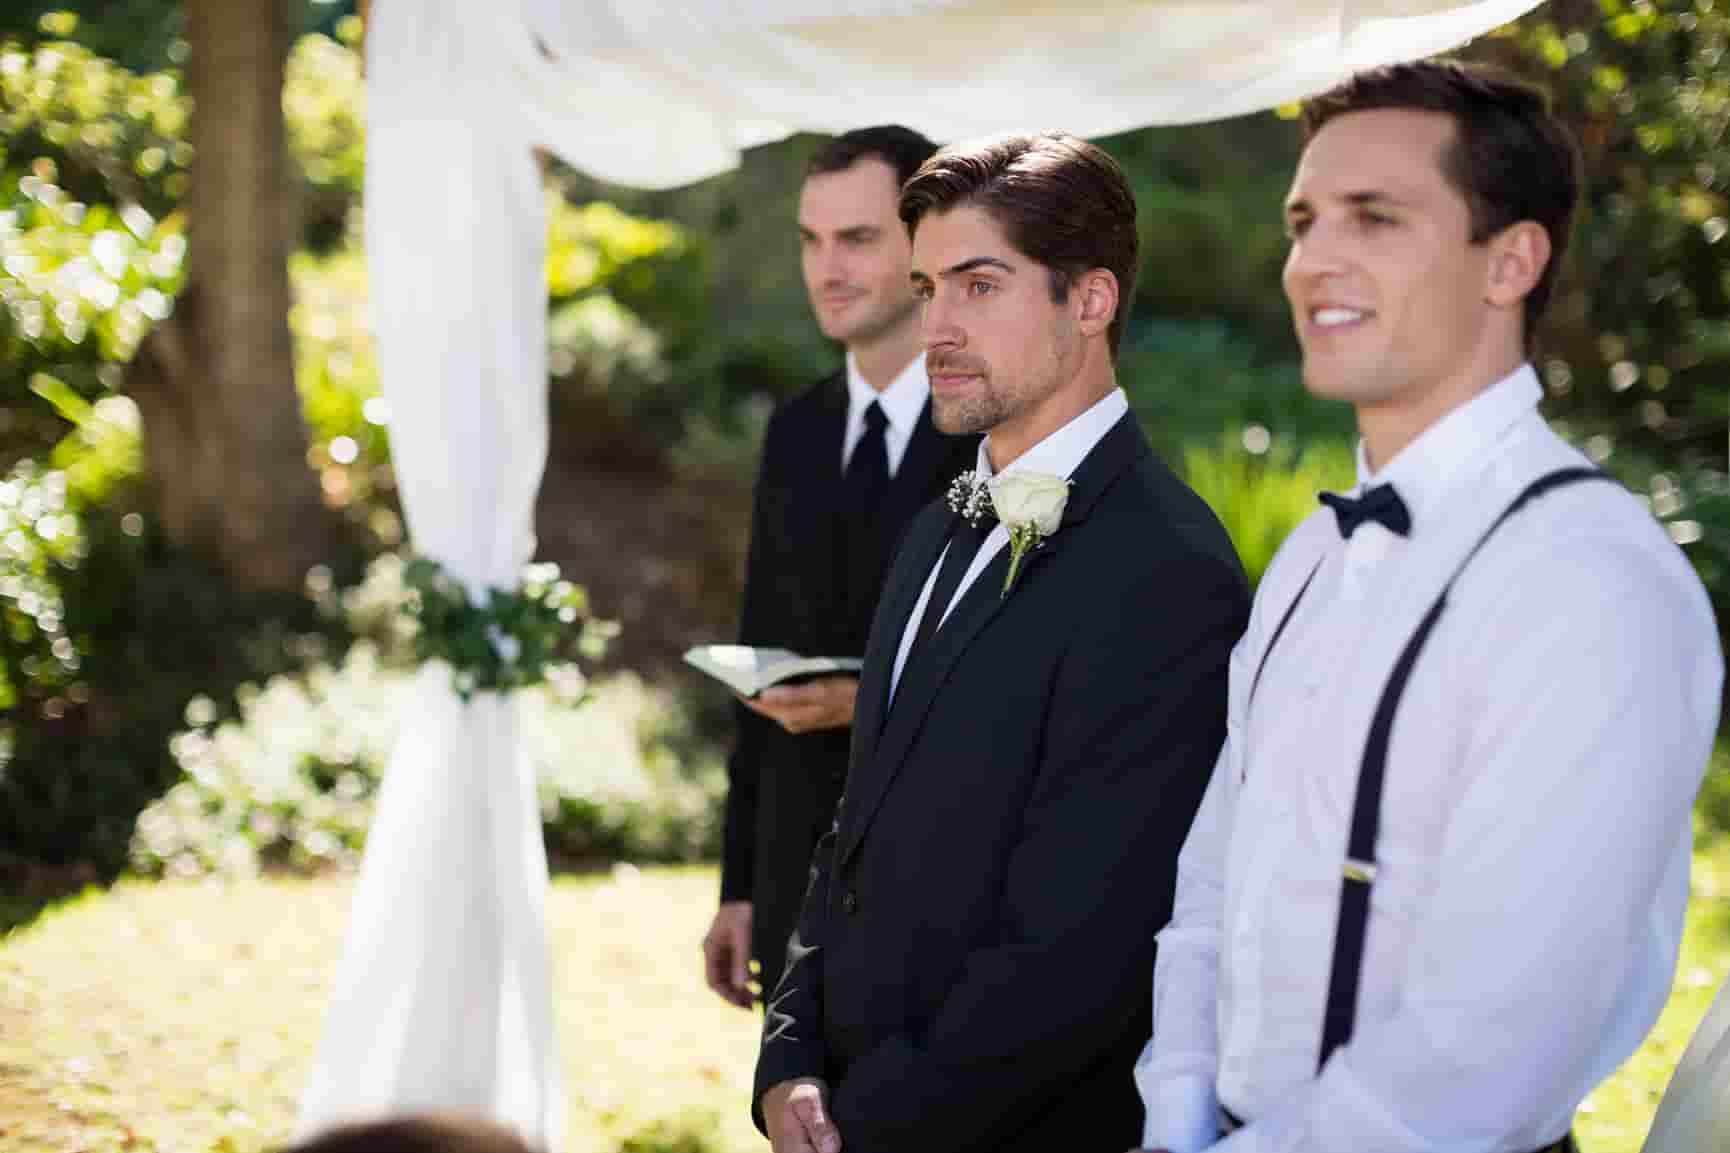 terno-padrino-de-boda